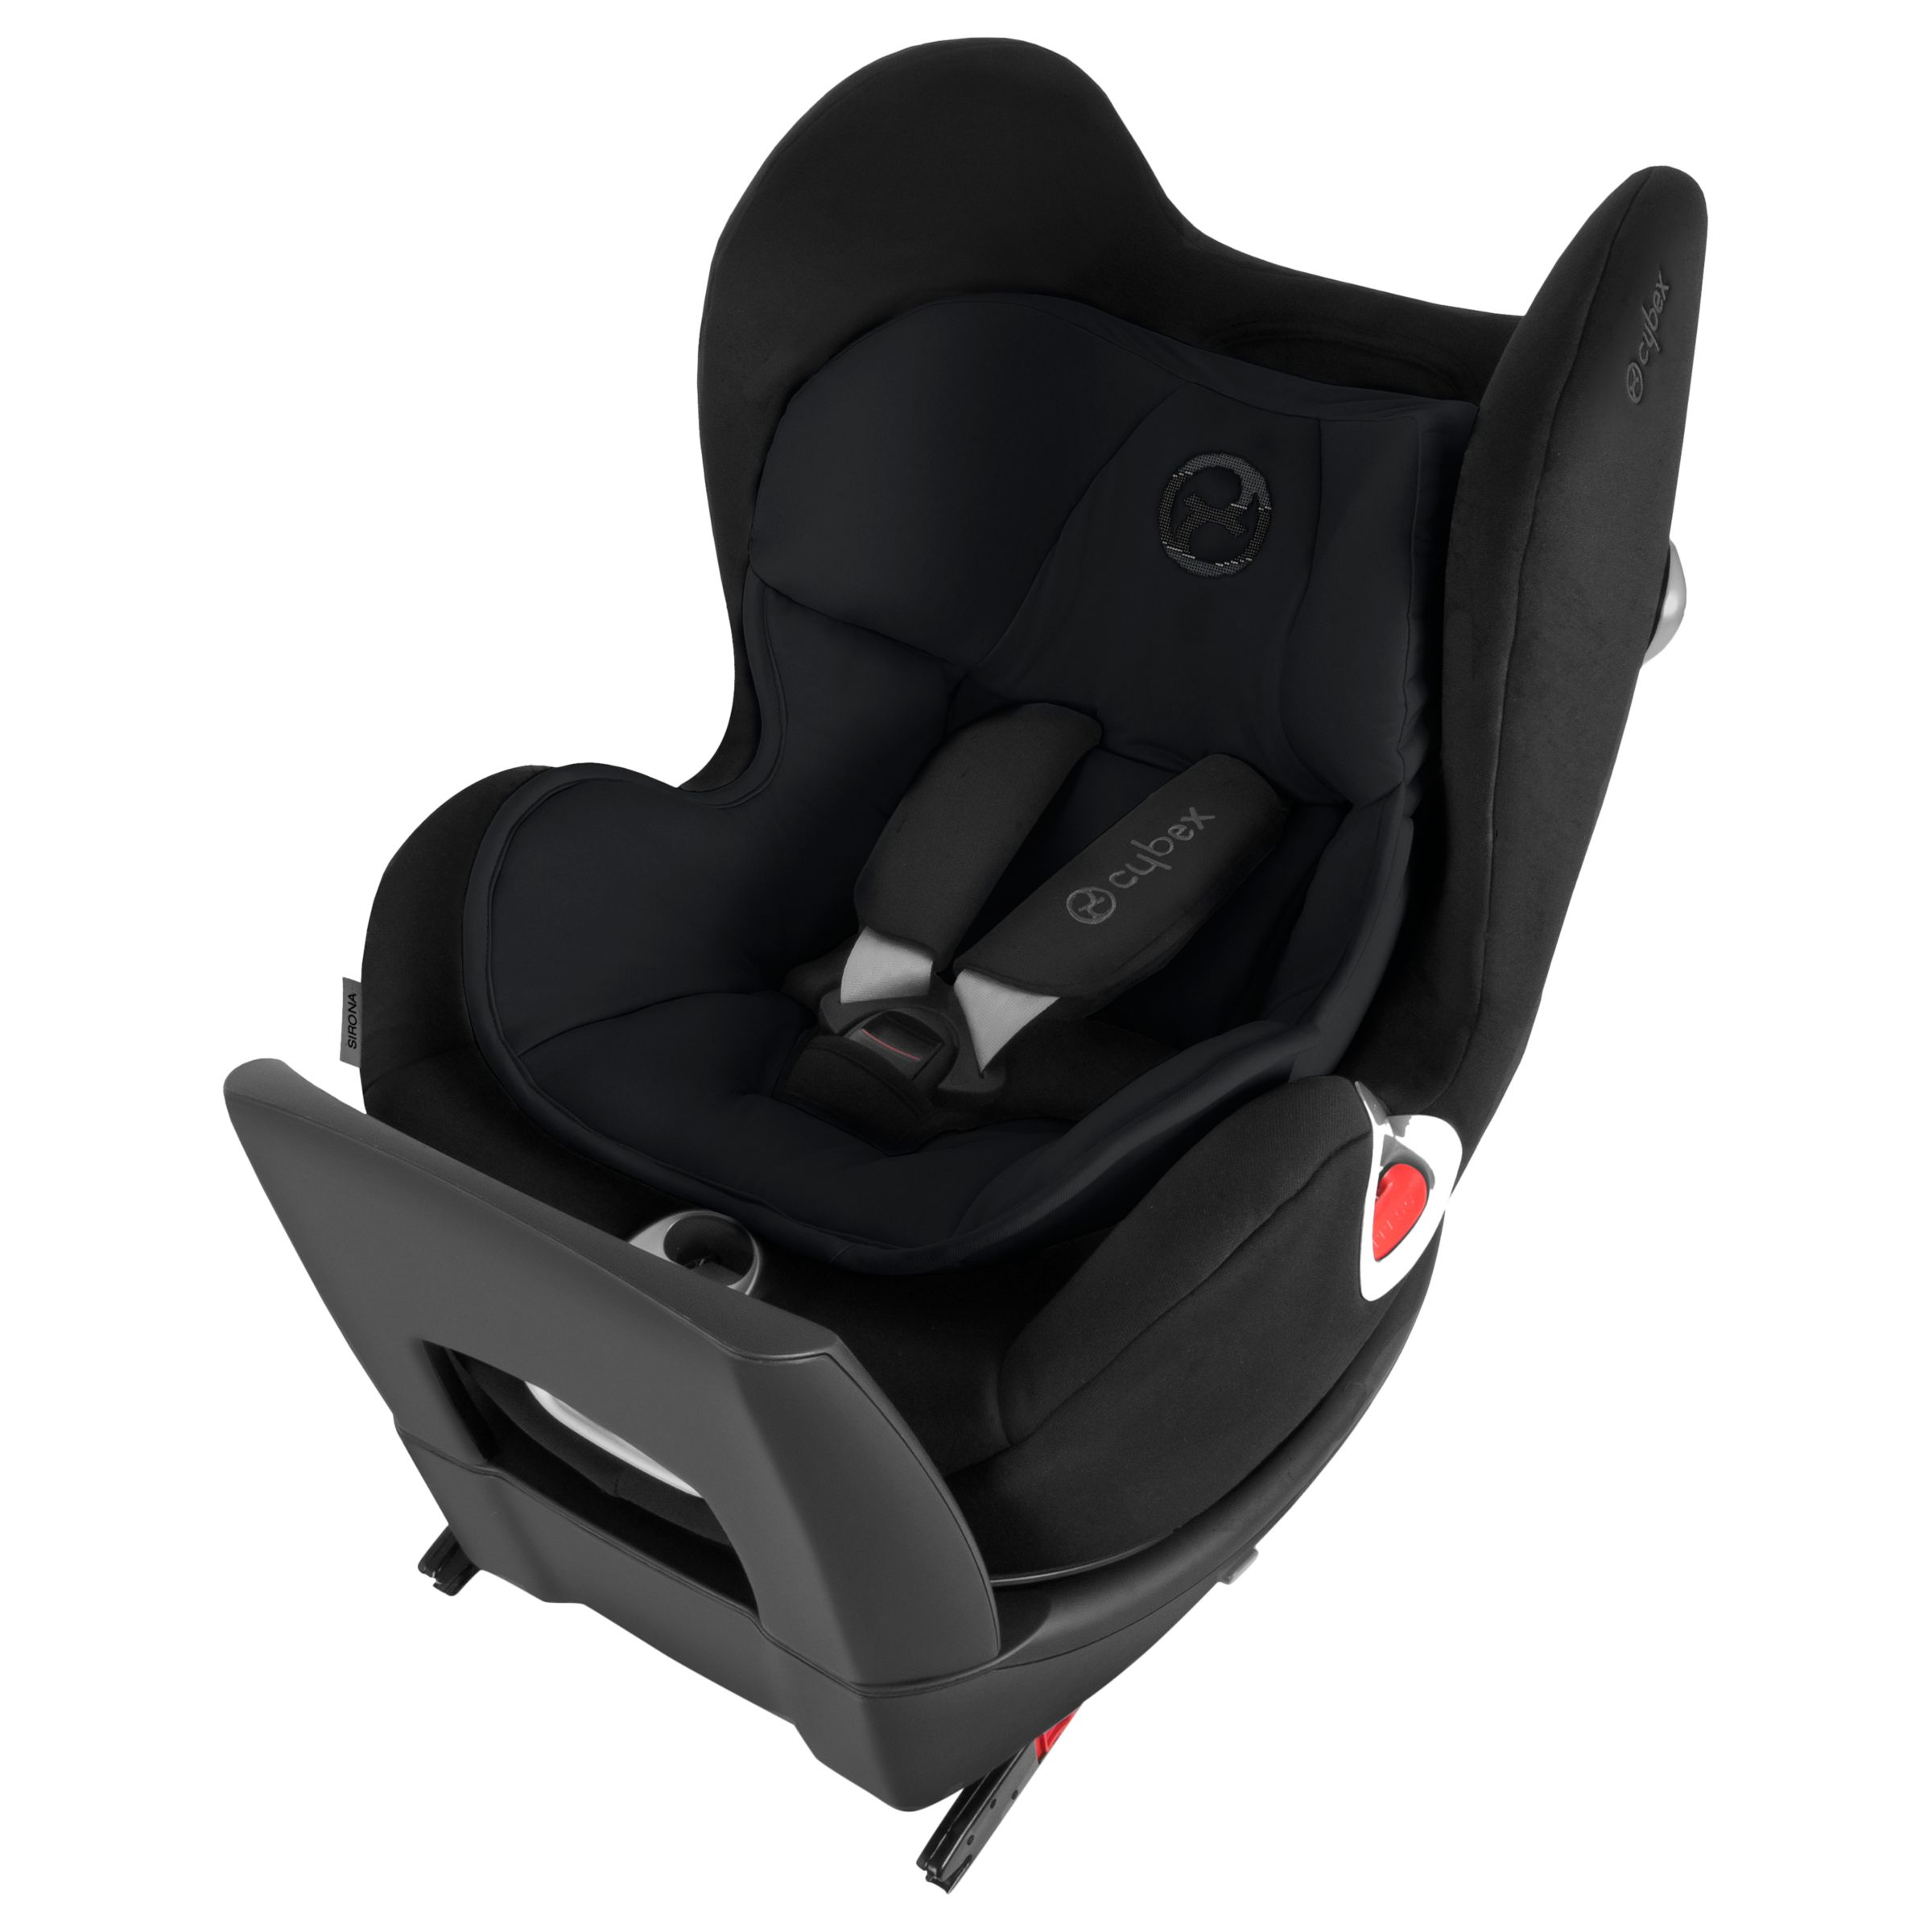 Cybex Cybex Sirona Group Newborn Baby Car Seat Inlay, Black